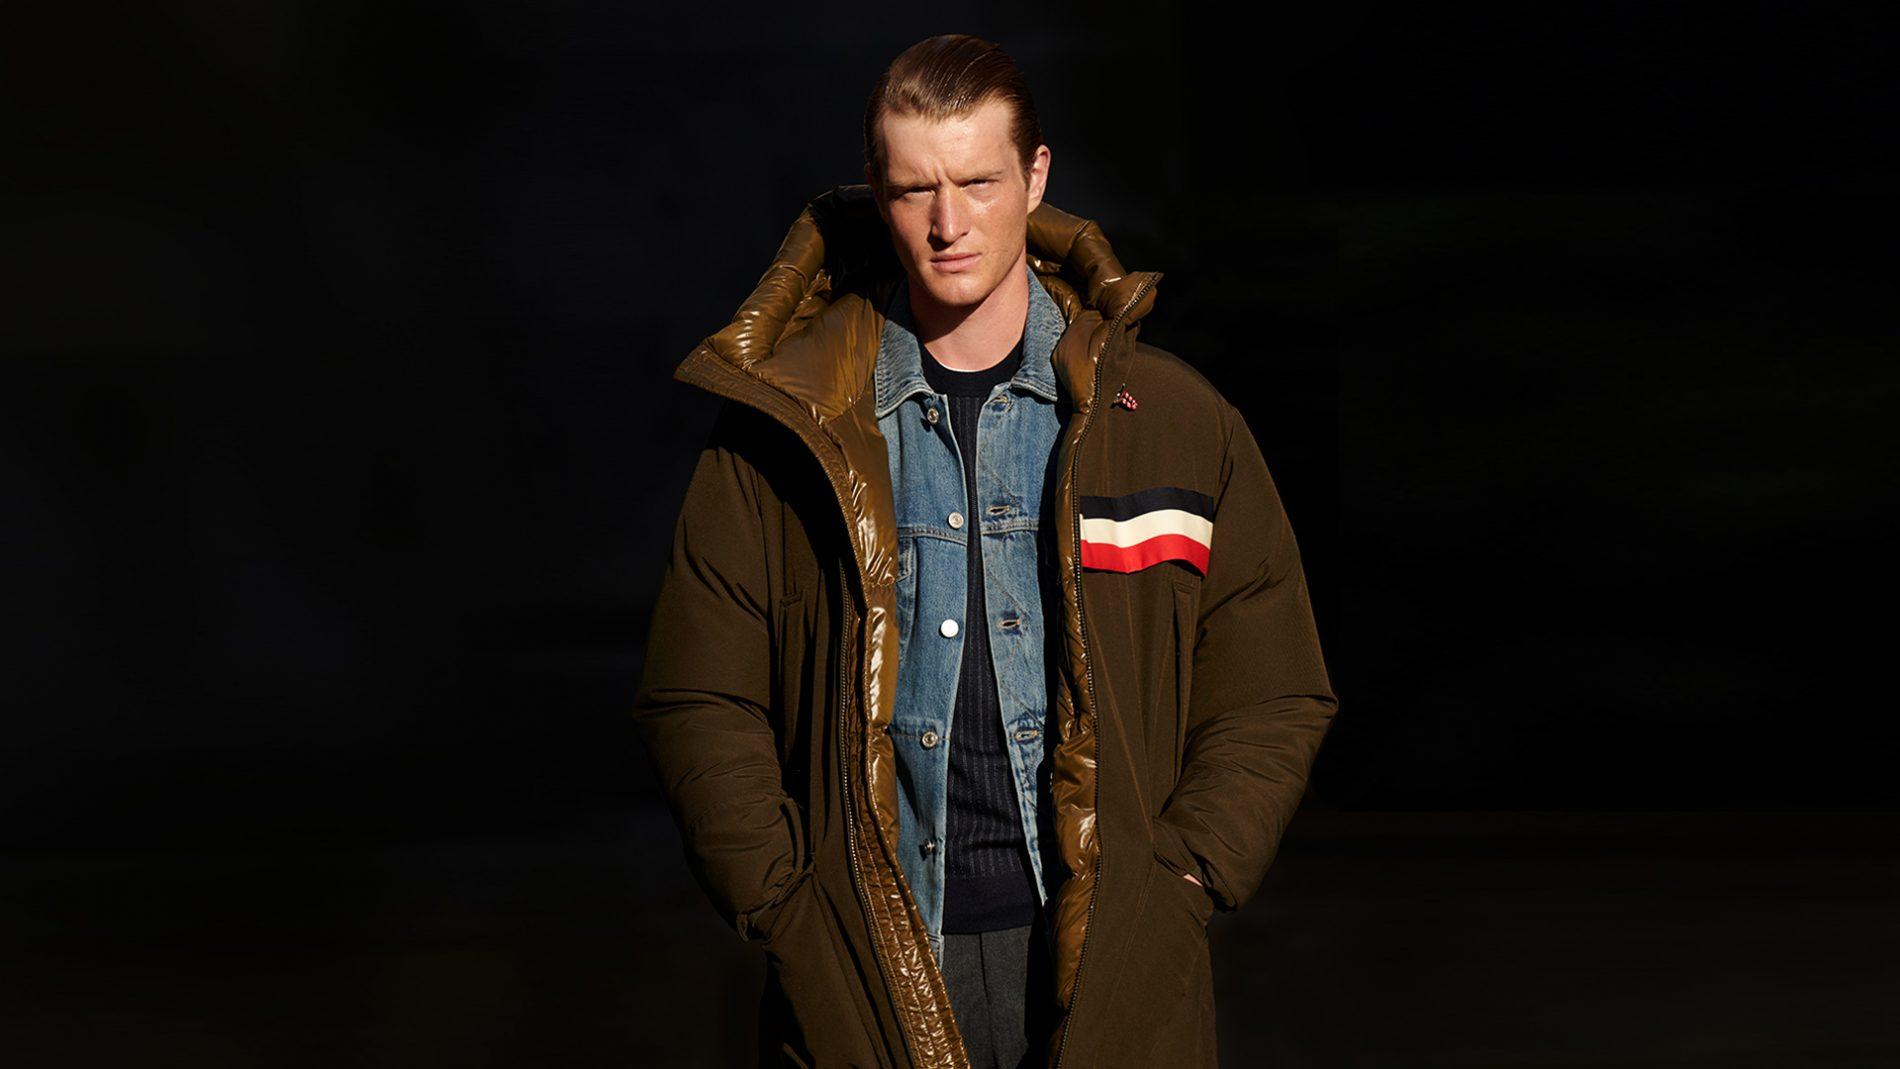 El Corte Inglés Designer Menswear Moncler Givenchy Brioni Ami